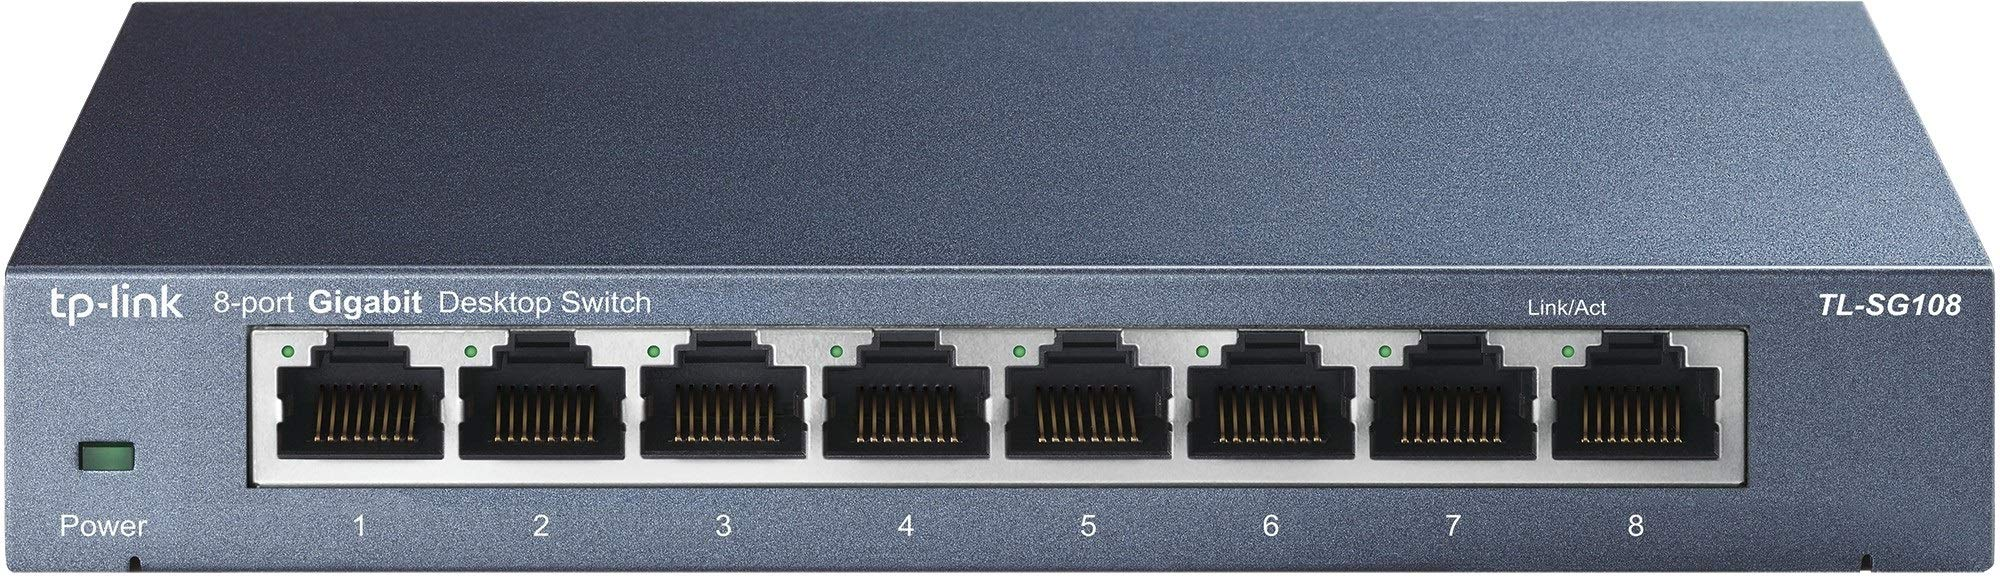 TP-Link 8 Port Gigabit Ethernet Network Switch | Ethernet Splitter | Sturdy Metal w/ Shielded Ports | Plug-and-Play | Traffic Optimization | Unmanaged (TL-SG108) by TP-LINK